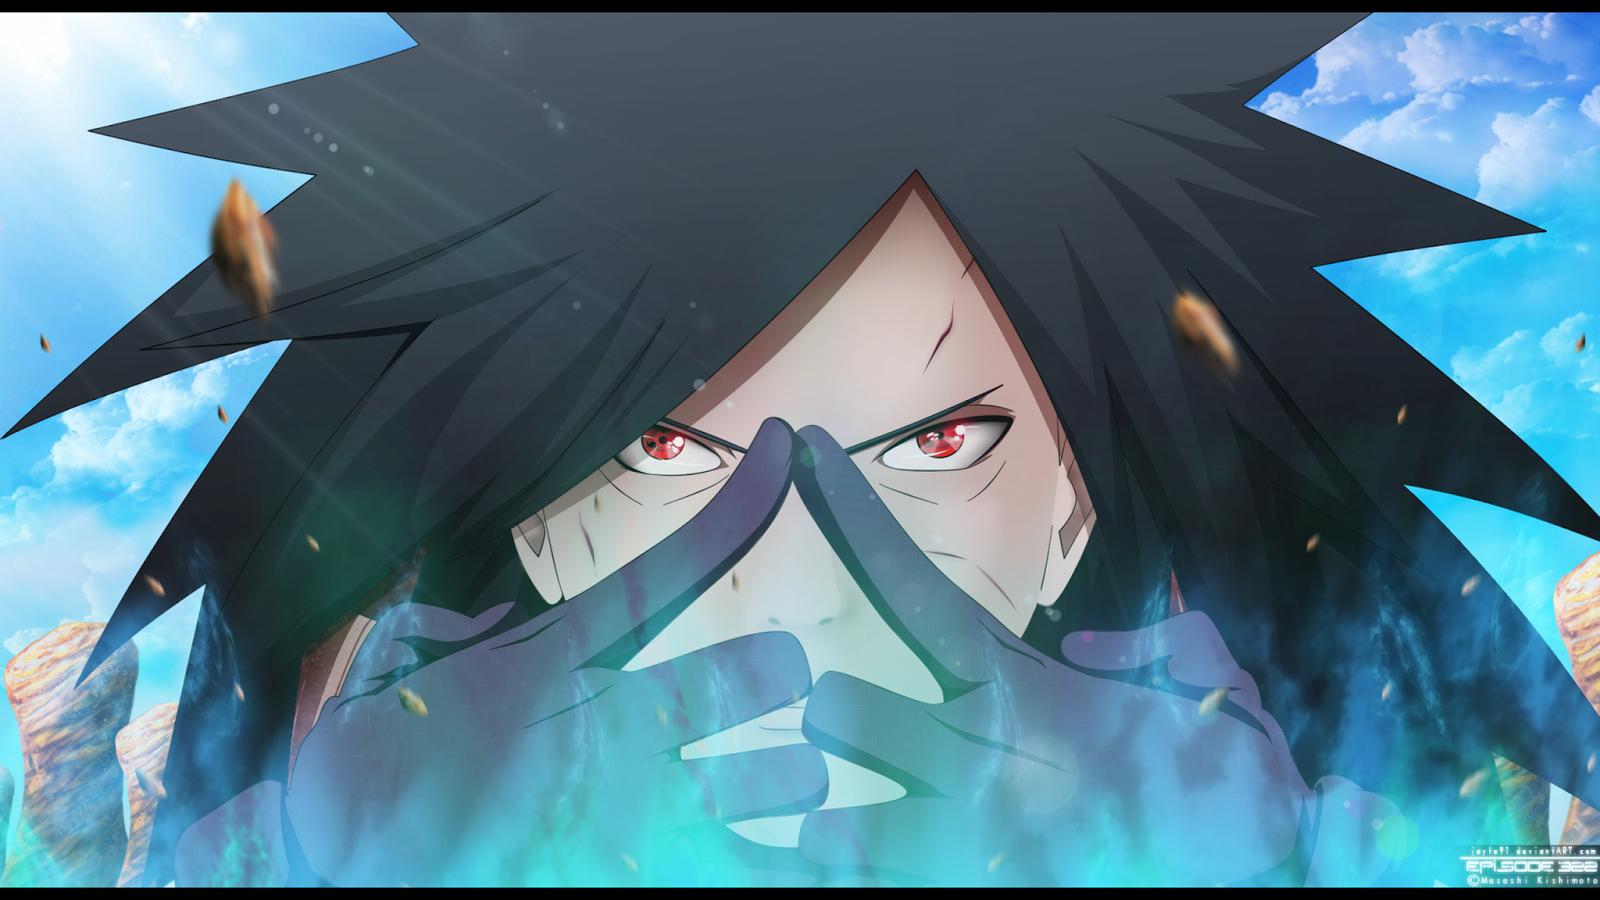 Uchiha Madara Technique Sharingan Male Anime HD Wallpaper Backgrounds 1600x900